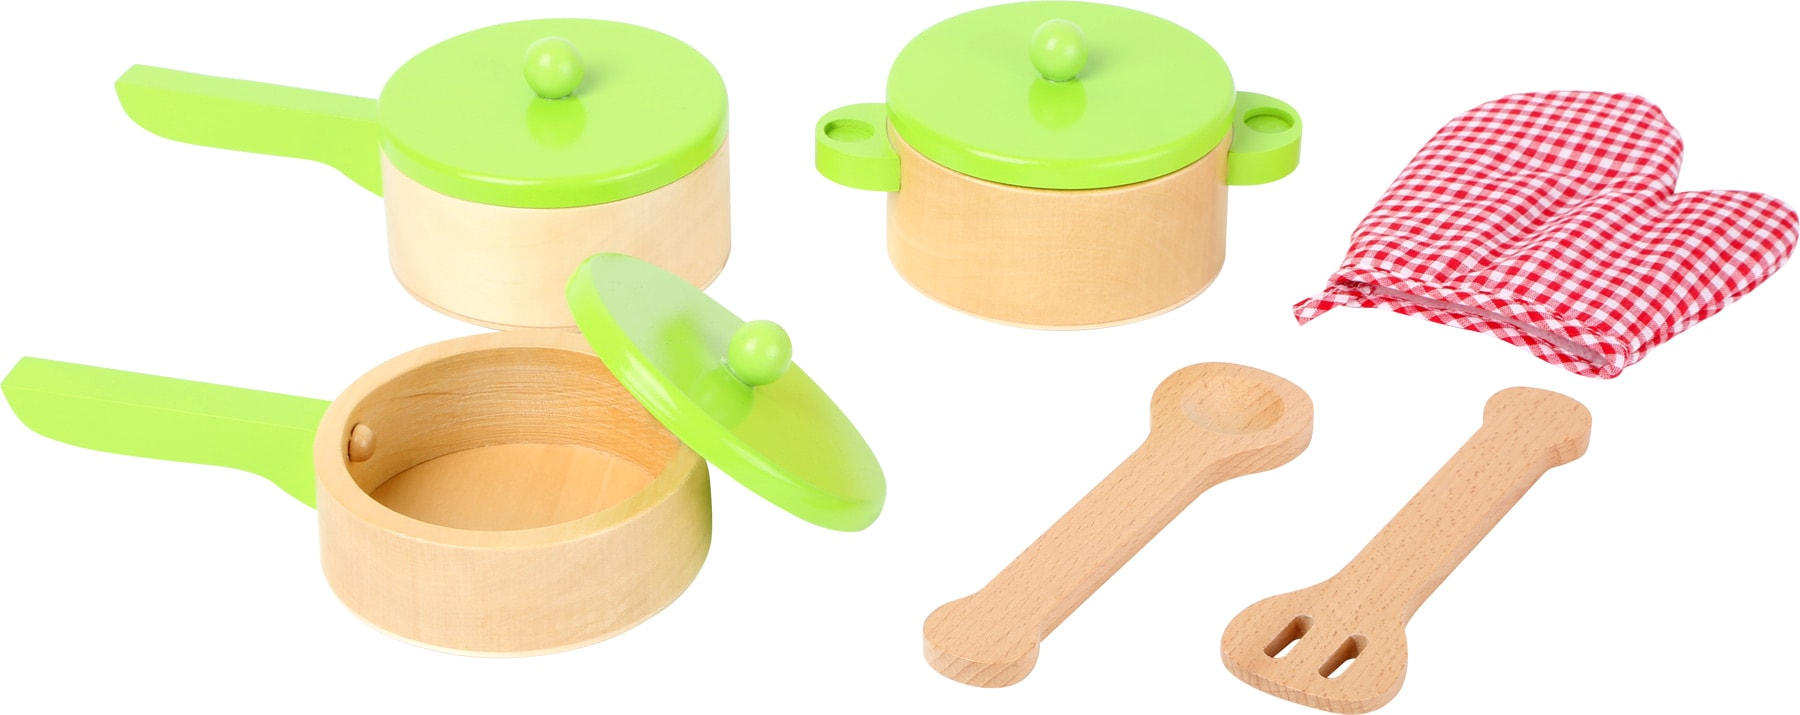 houten potten pannen keuken